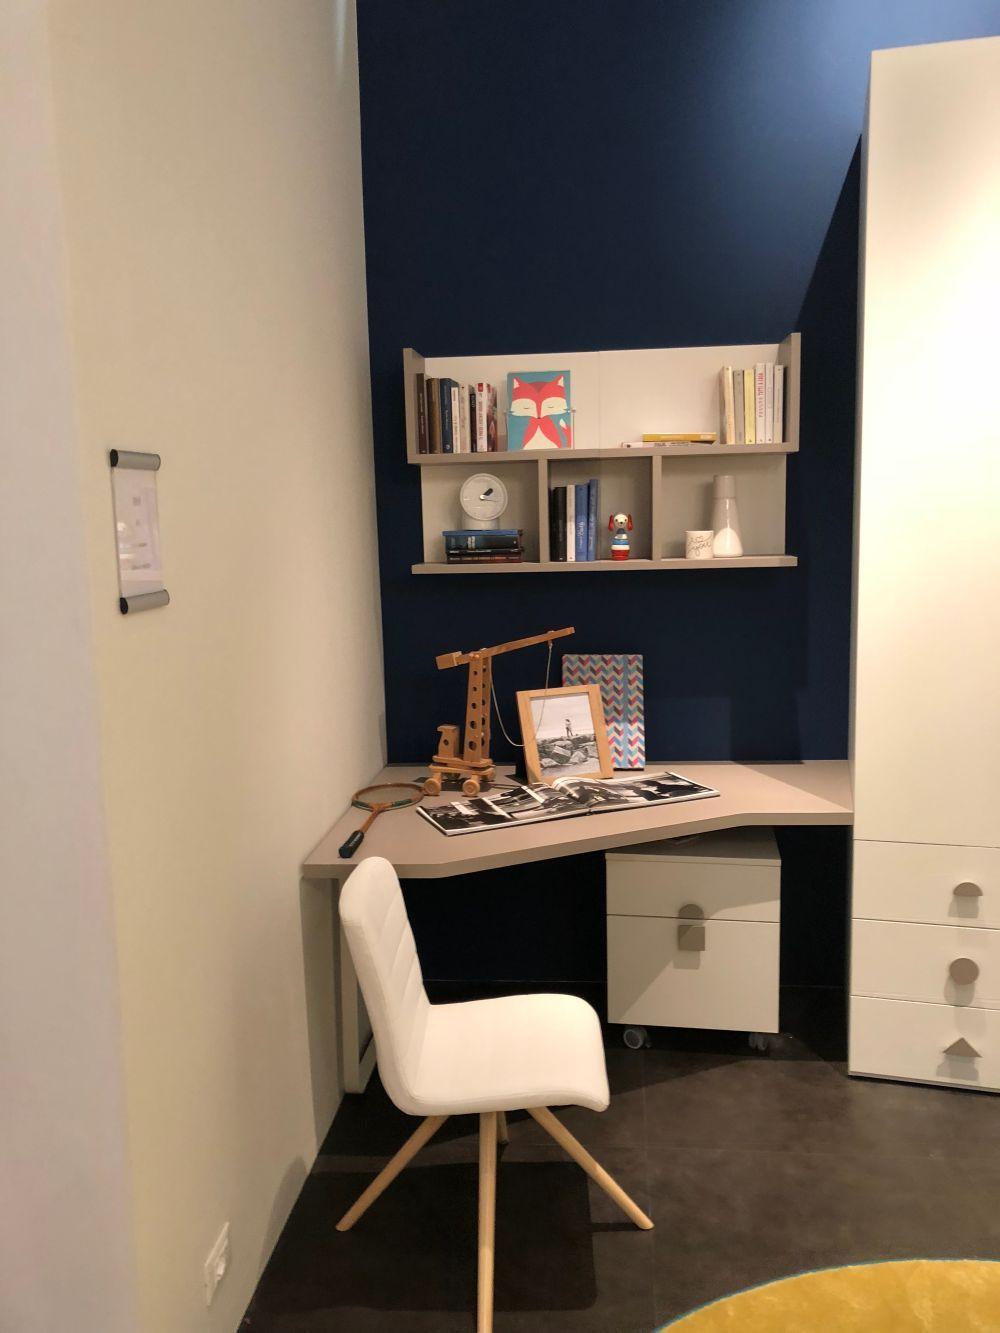 10 corner decoration ideas that actually make sense furniture rh pinterest com